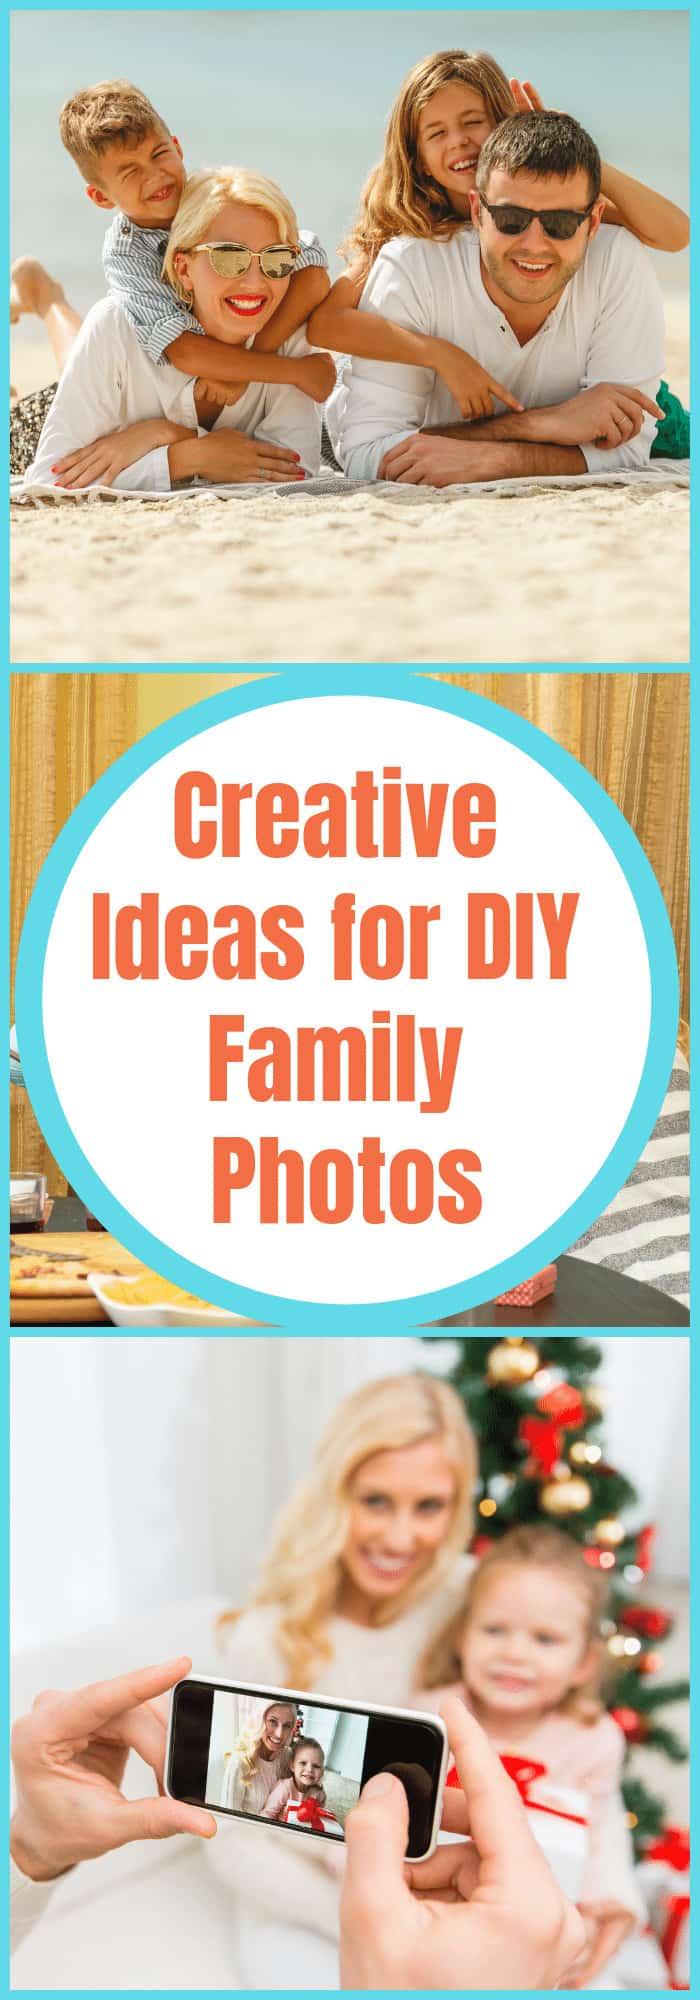 Creative Ideas for DIY Family Photos